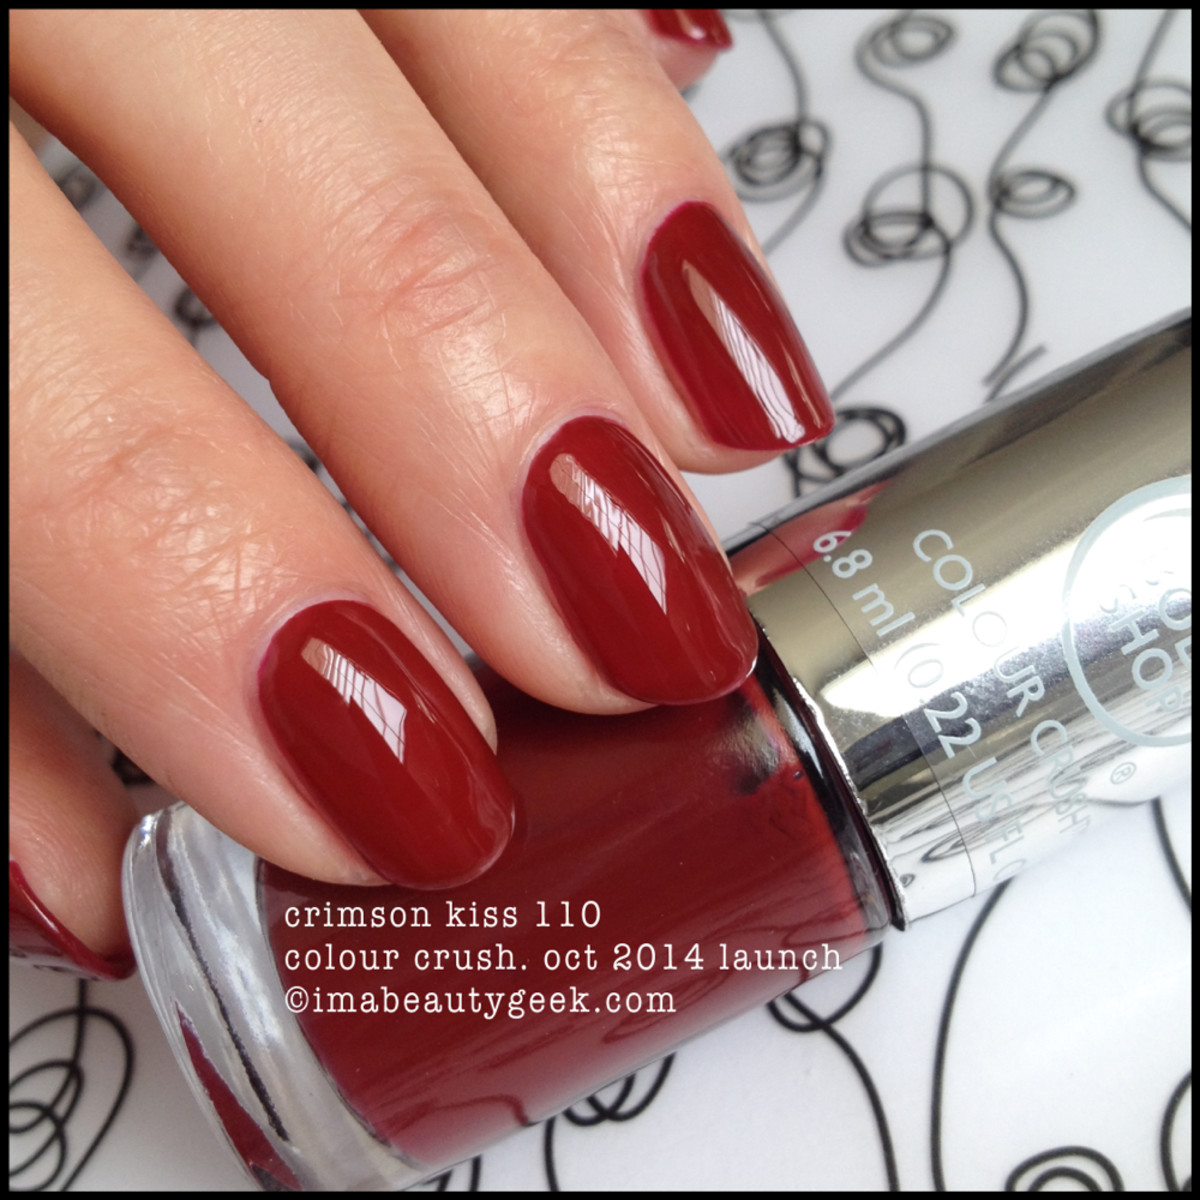 Body Shop Crimson Kiss 110 Colour Crush Polish